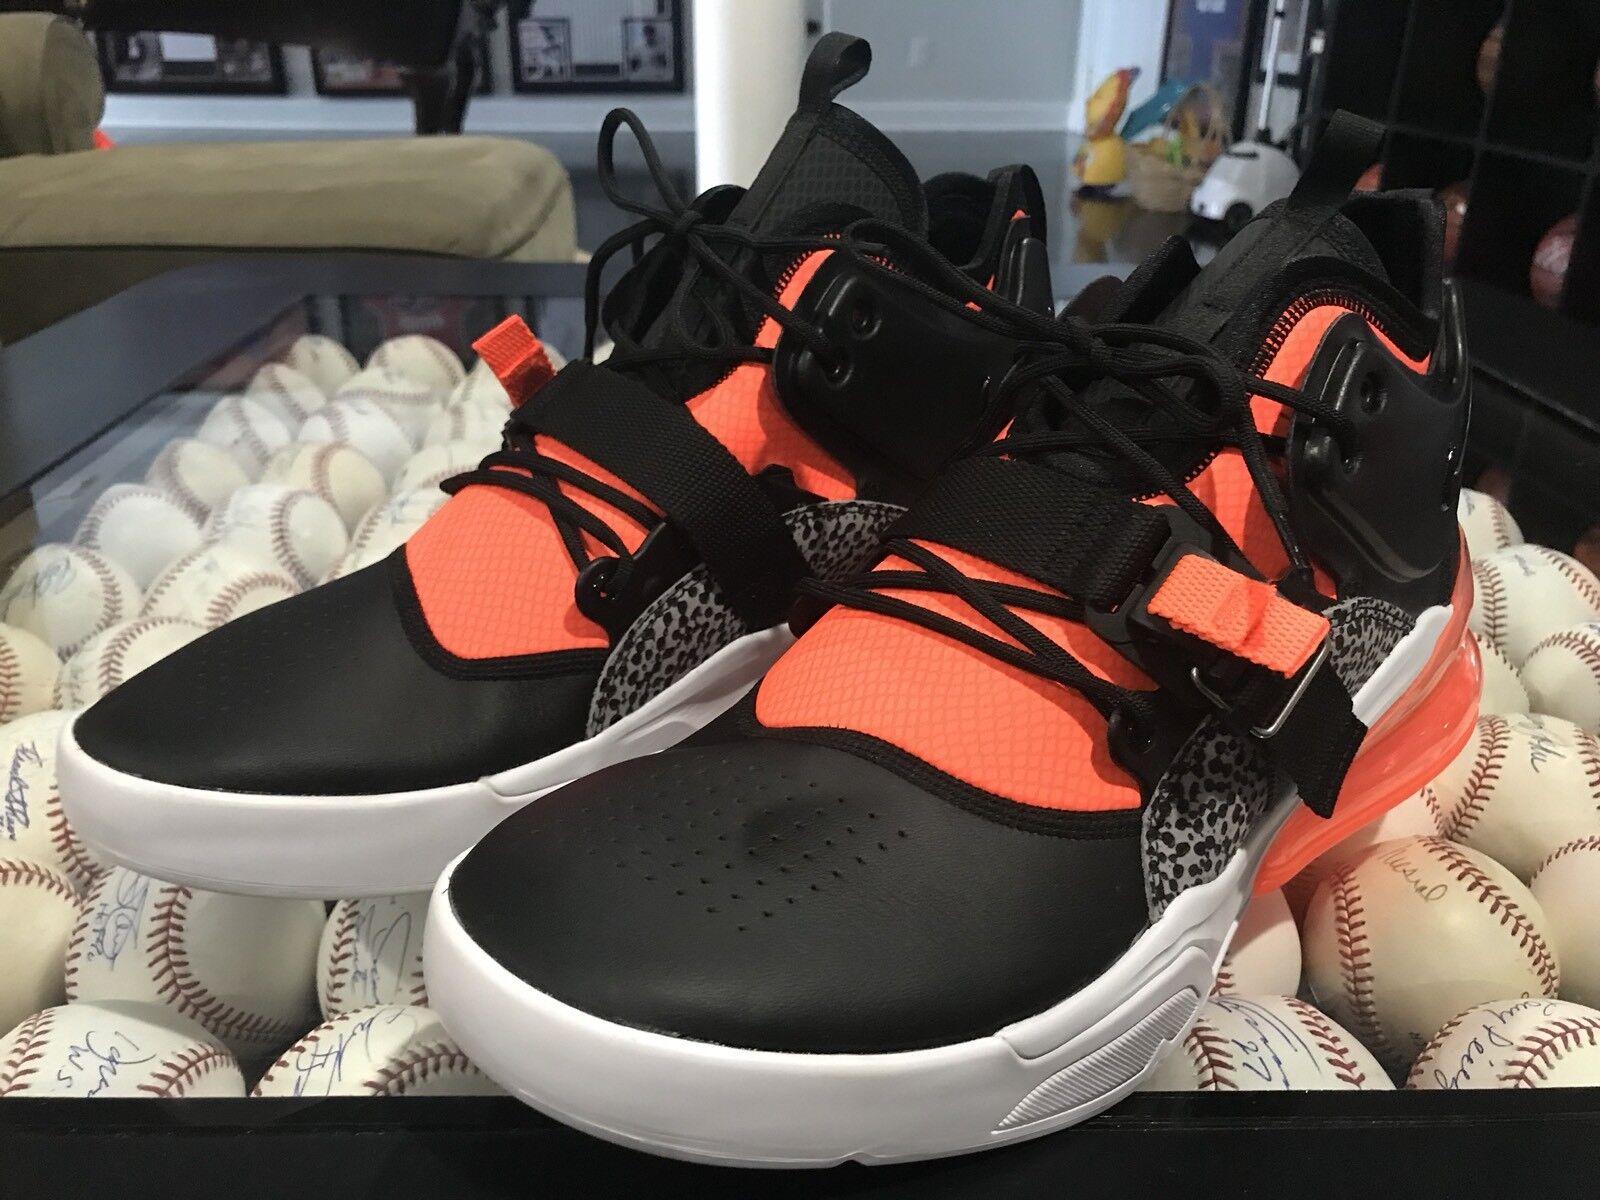 Nike Air Force 270, Black Hyper Crimson Wolf Grey, AH6772-004, No Lid, Size 14